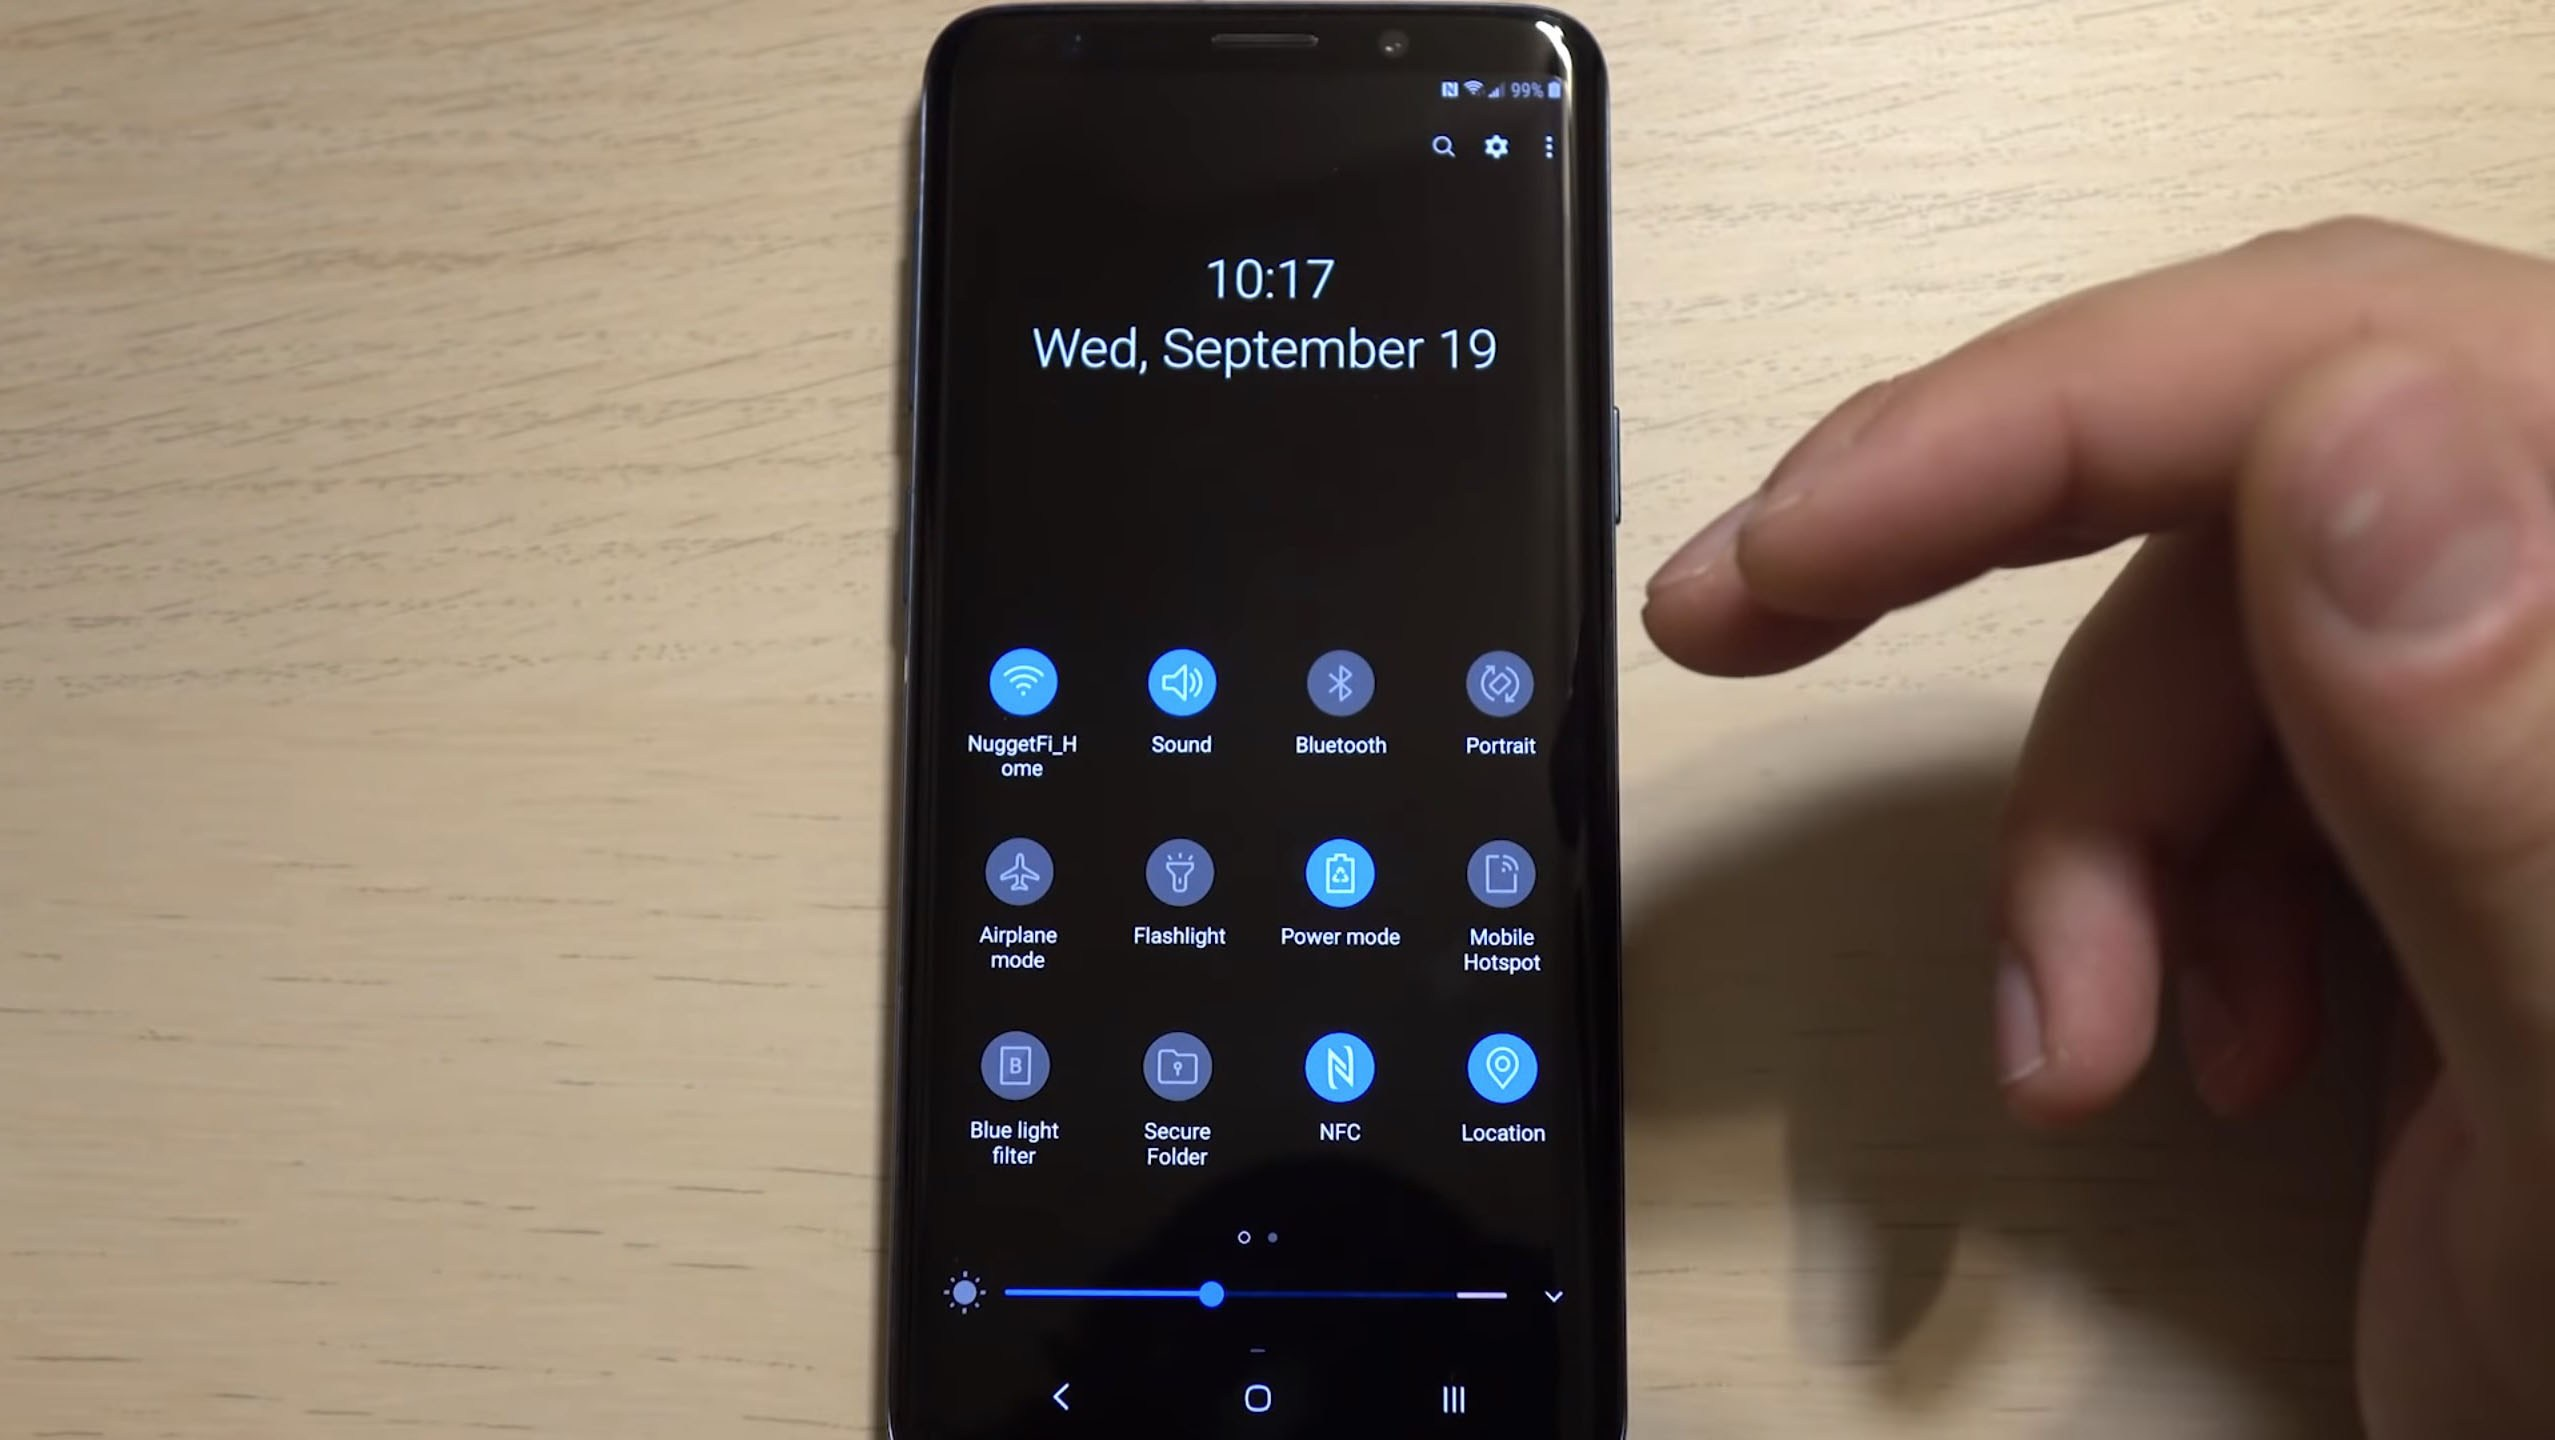 Samsung Galaxy S9 : voilà maintenant un aperçu vidéo d'Android 9 Pie